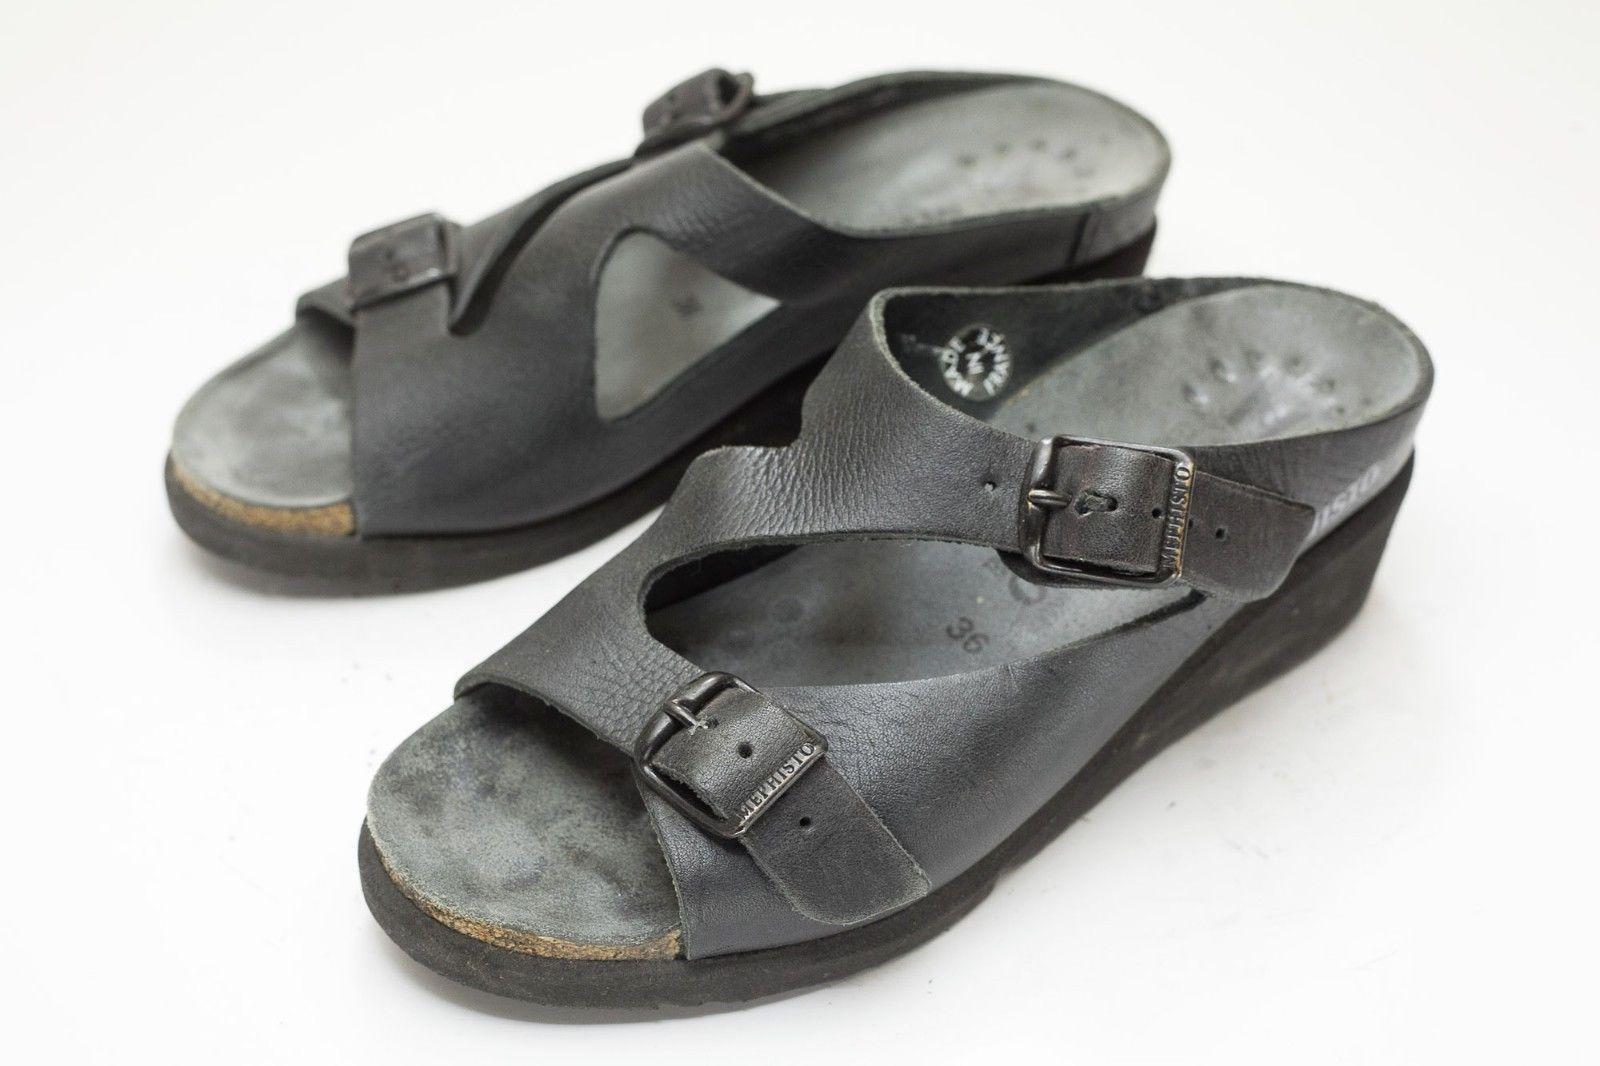 Mephisto 6 Dark Gray / Black Sandals Women's EU 36